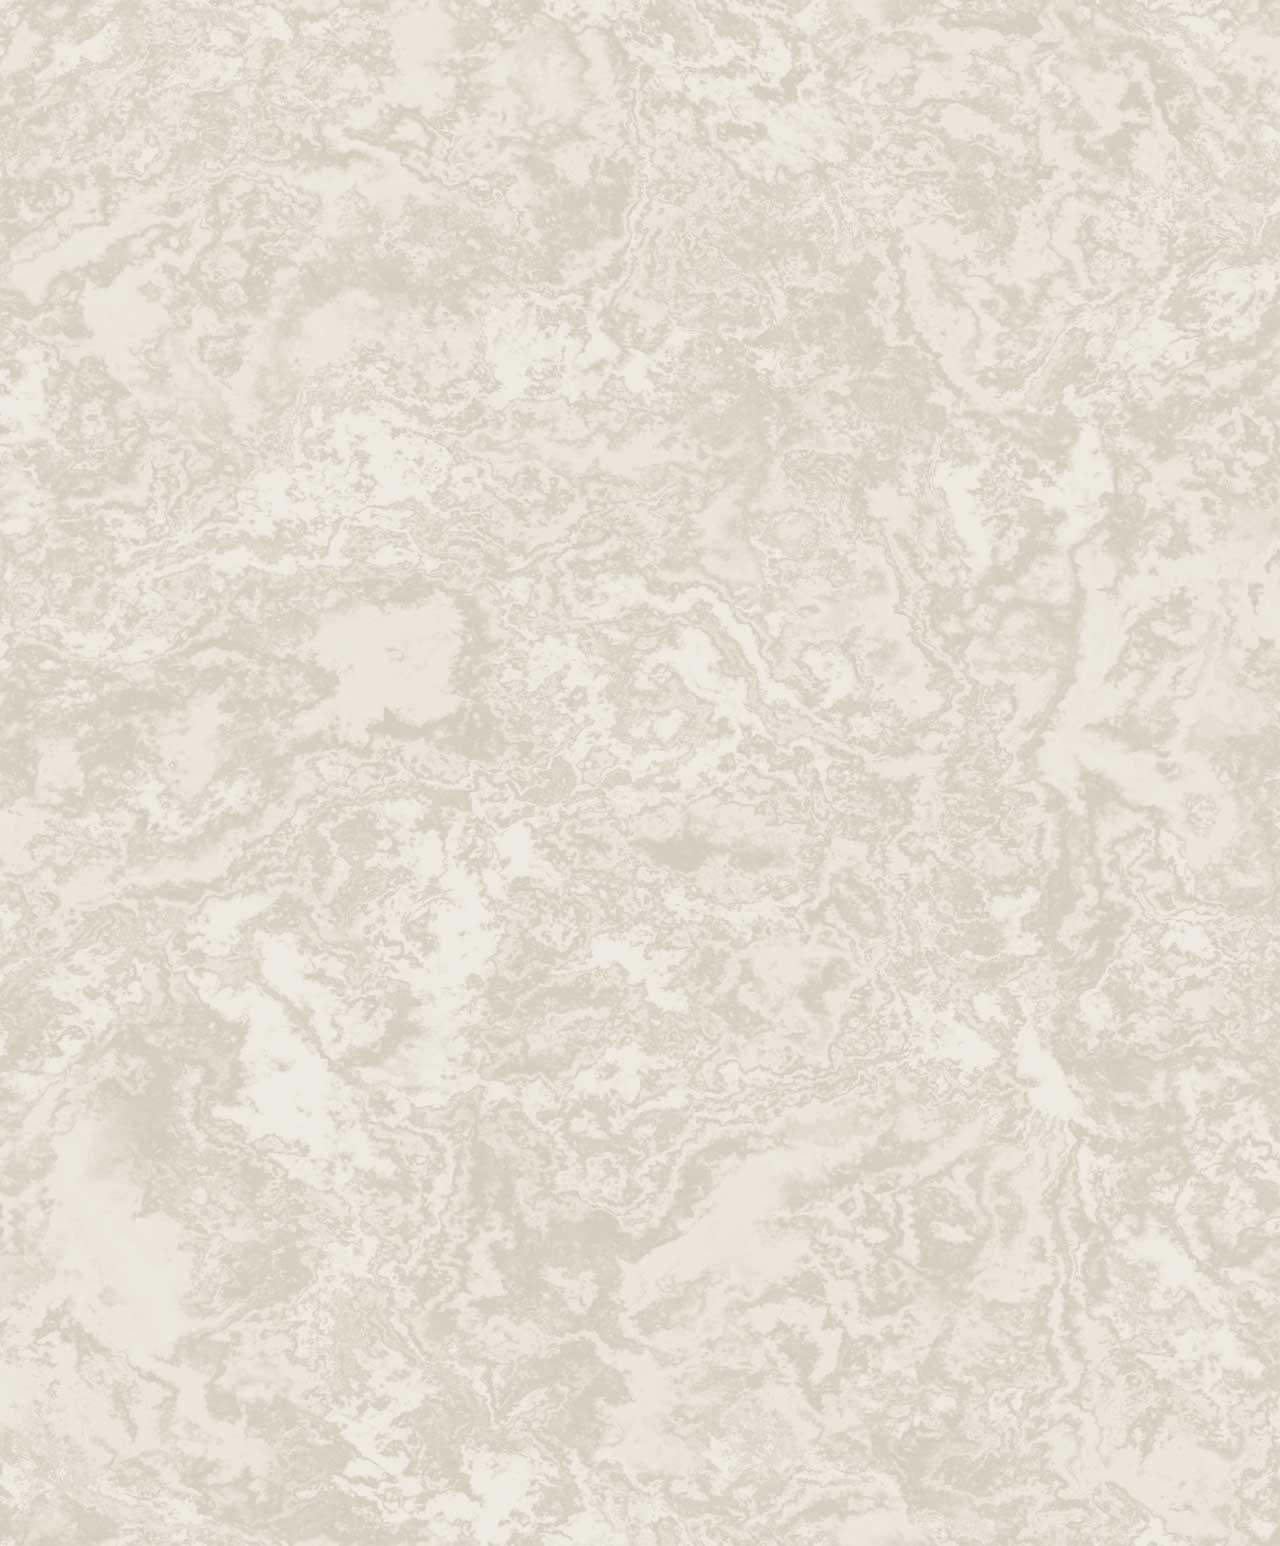 Fantastic Wallpaper Marble Silver - Capri-Luxury-Wallpaper-CP00707-CLOUD-MARBLE  Pic_4097100.jpg